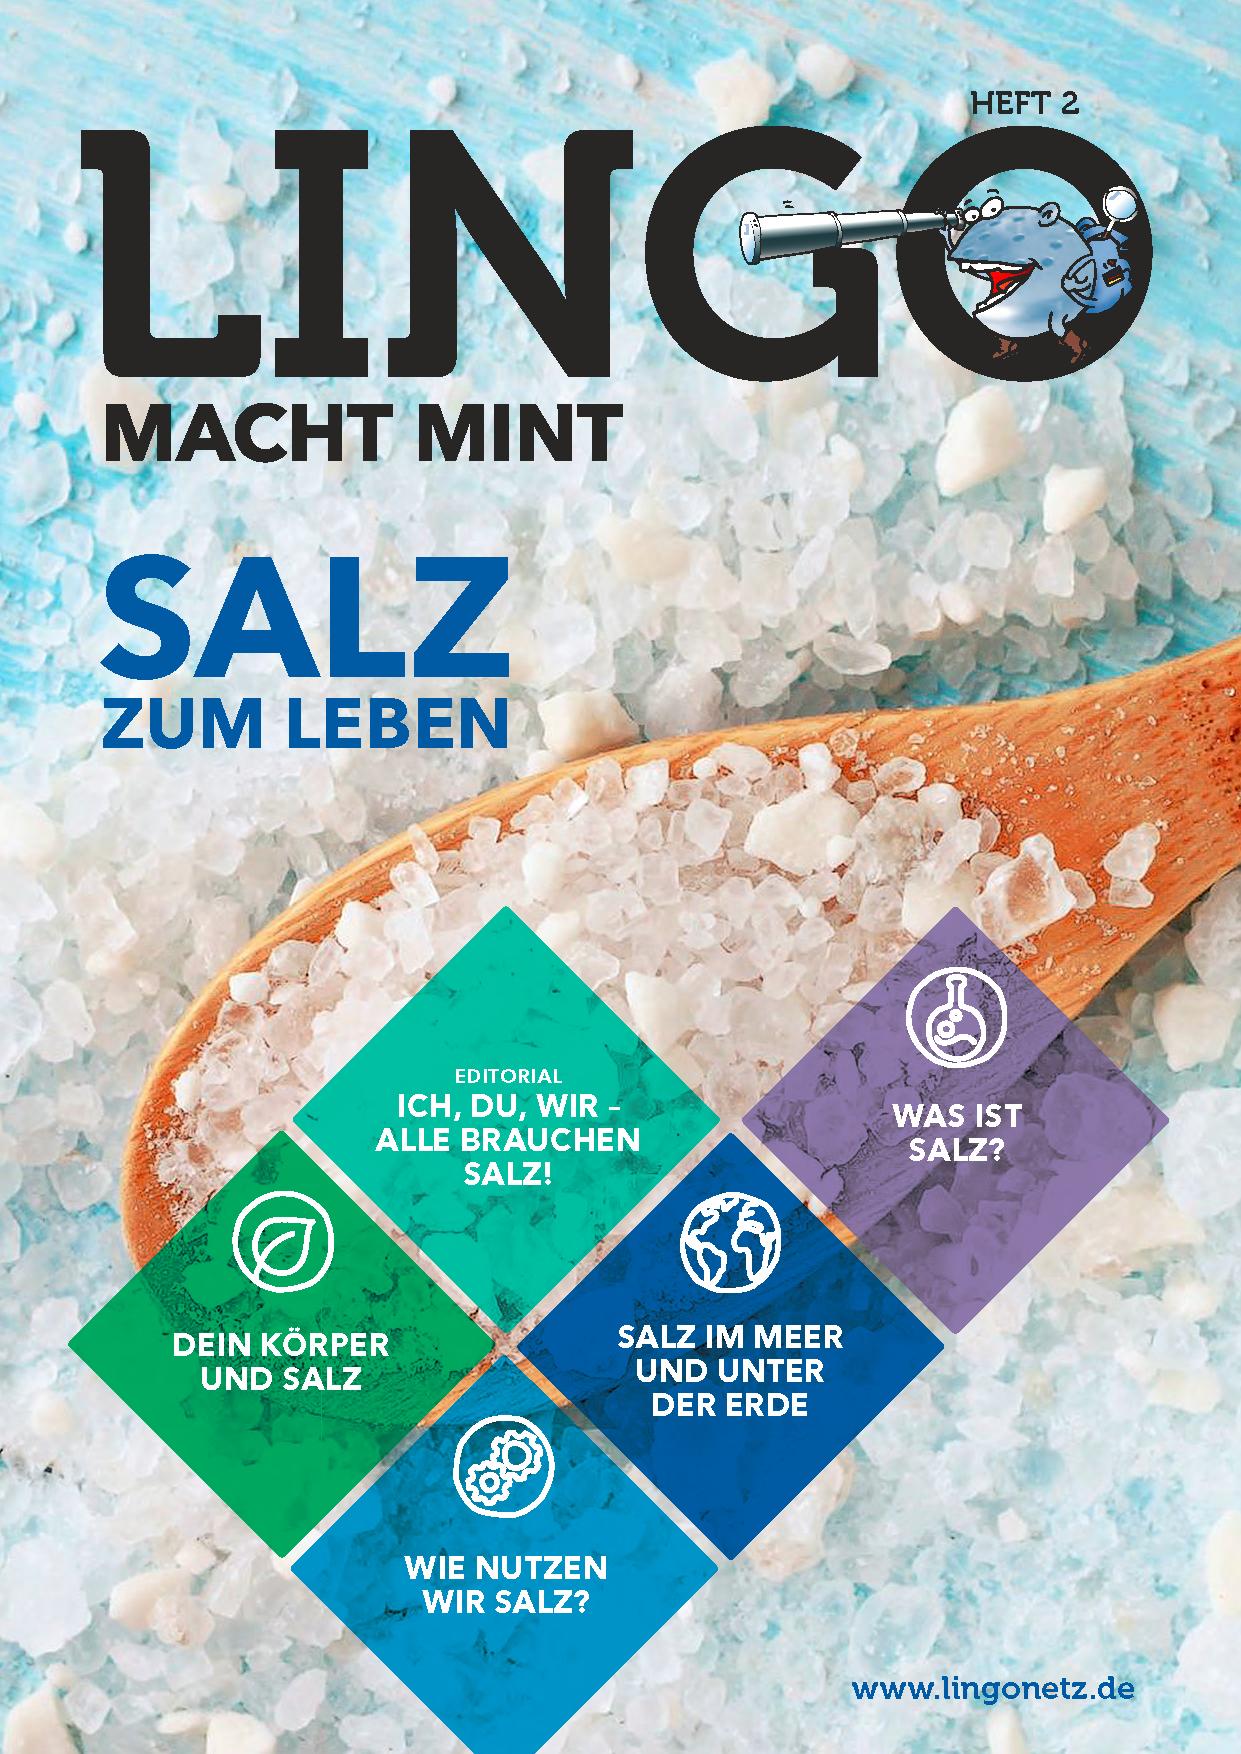 Lingo macht MINT: Arbeitsblätter und Lehrer-Info zu Heft 2 | Lingo ...